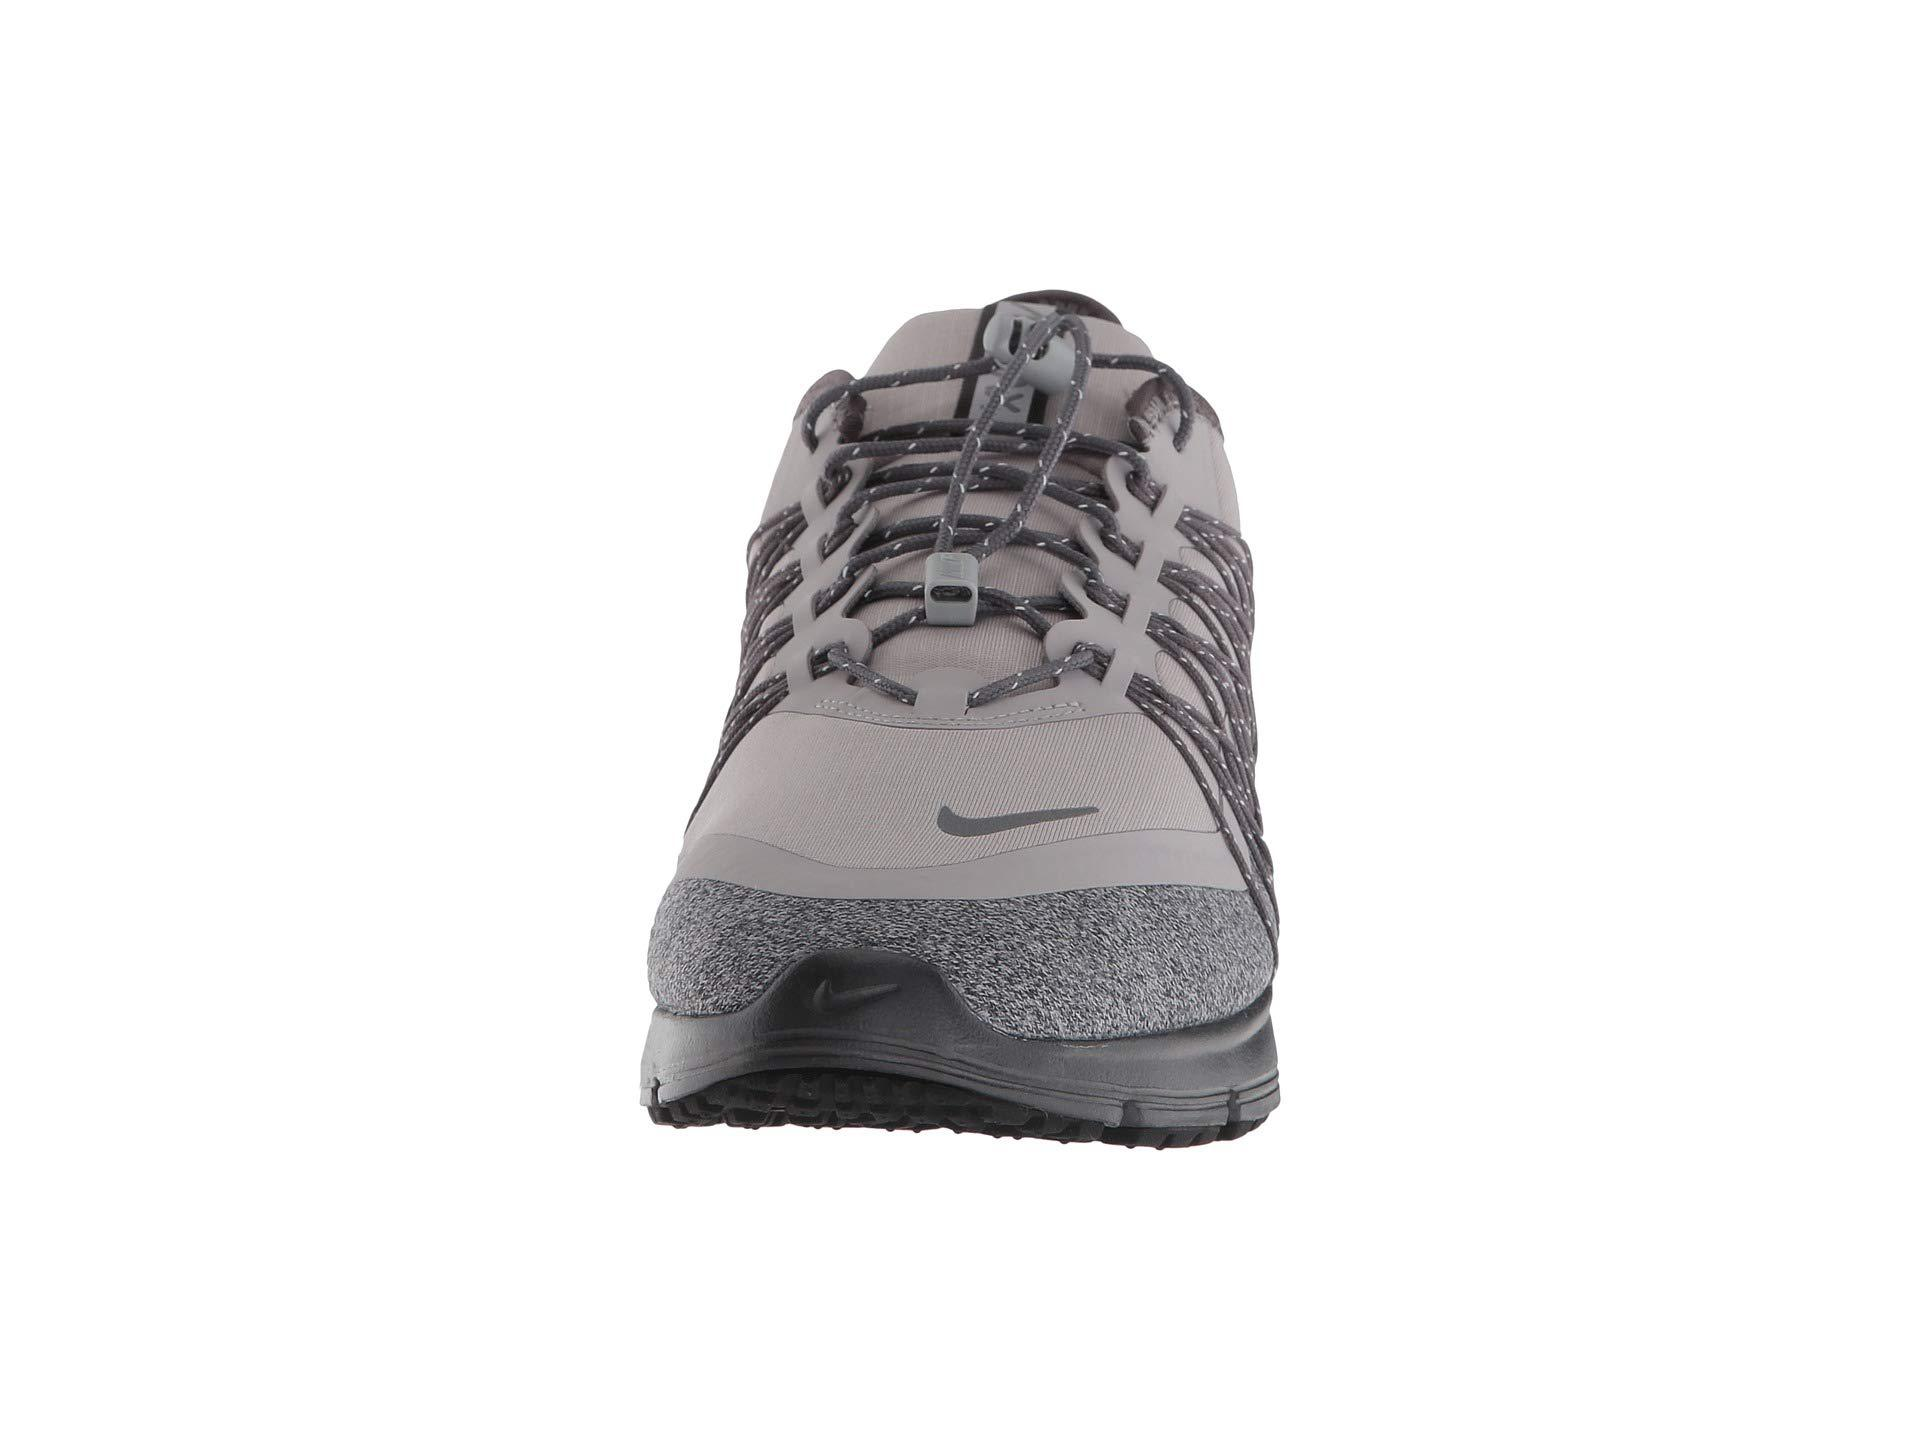 Nike Gray Air Max Sequent 4 Shield (dark Greymetallic Silverblack) Running Shoes